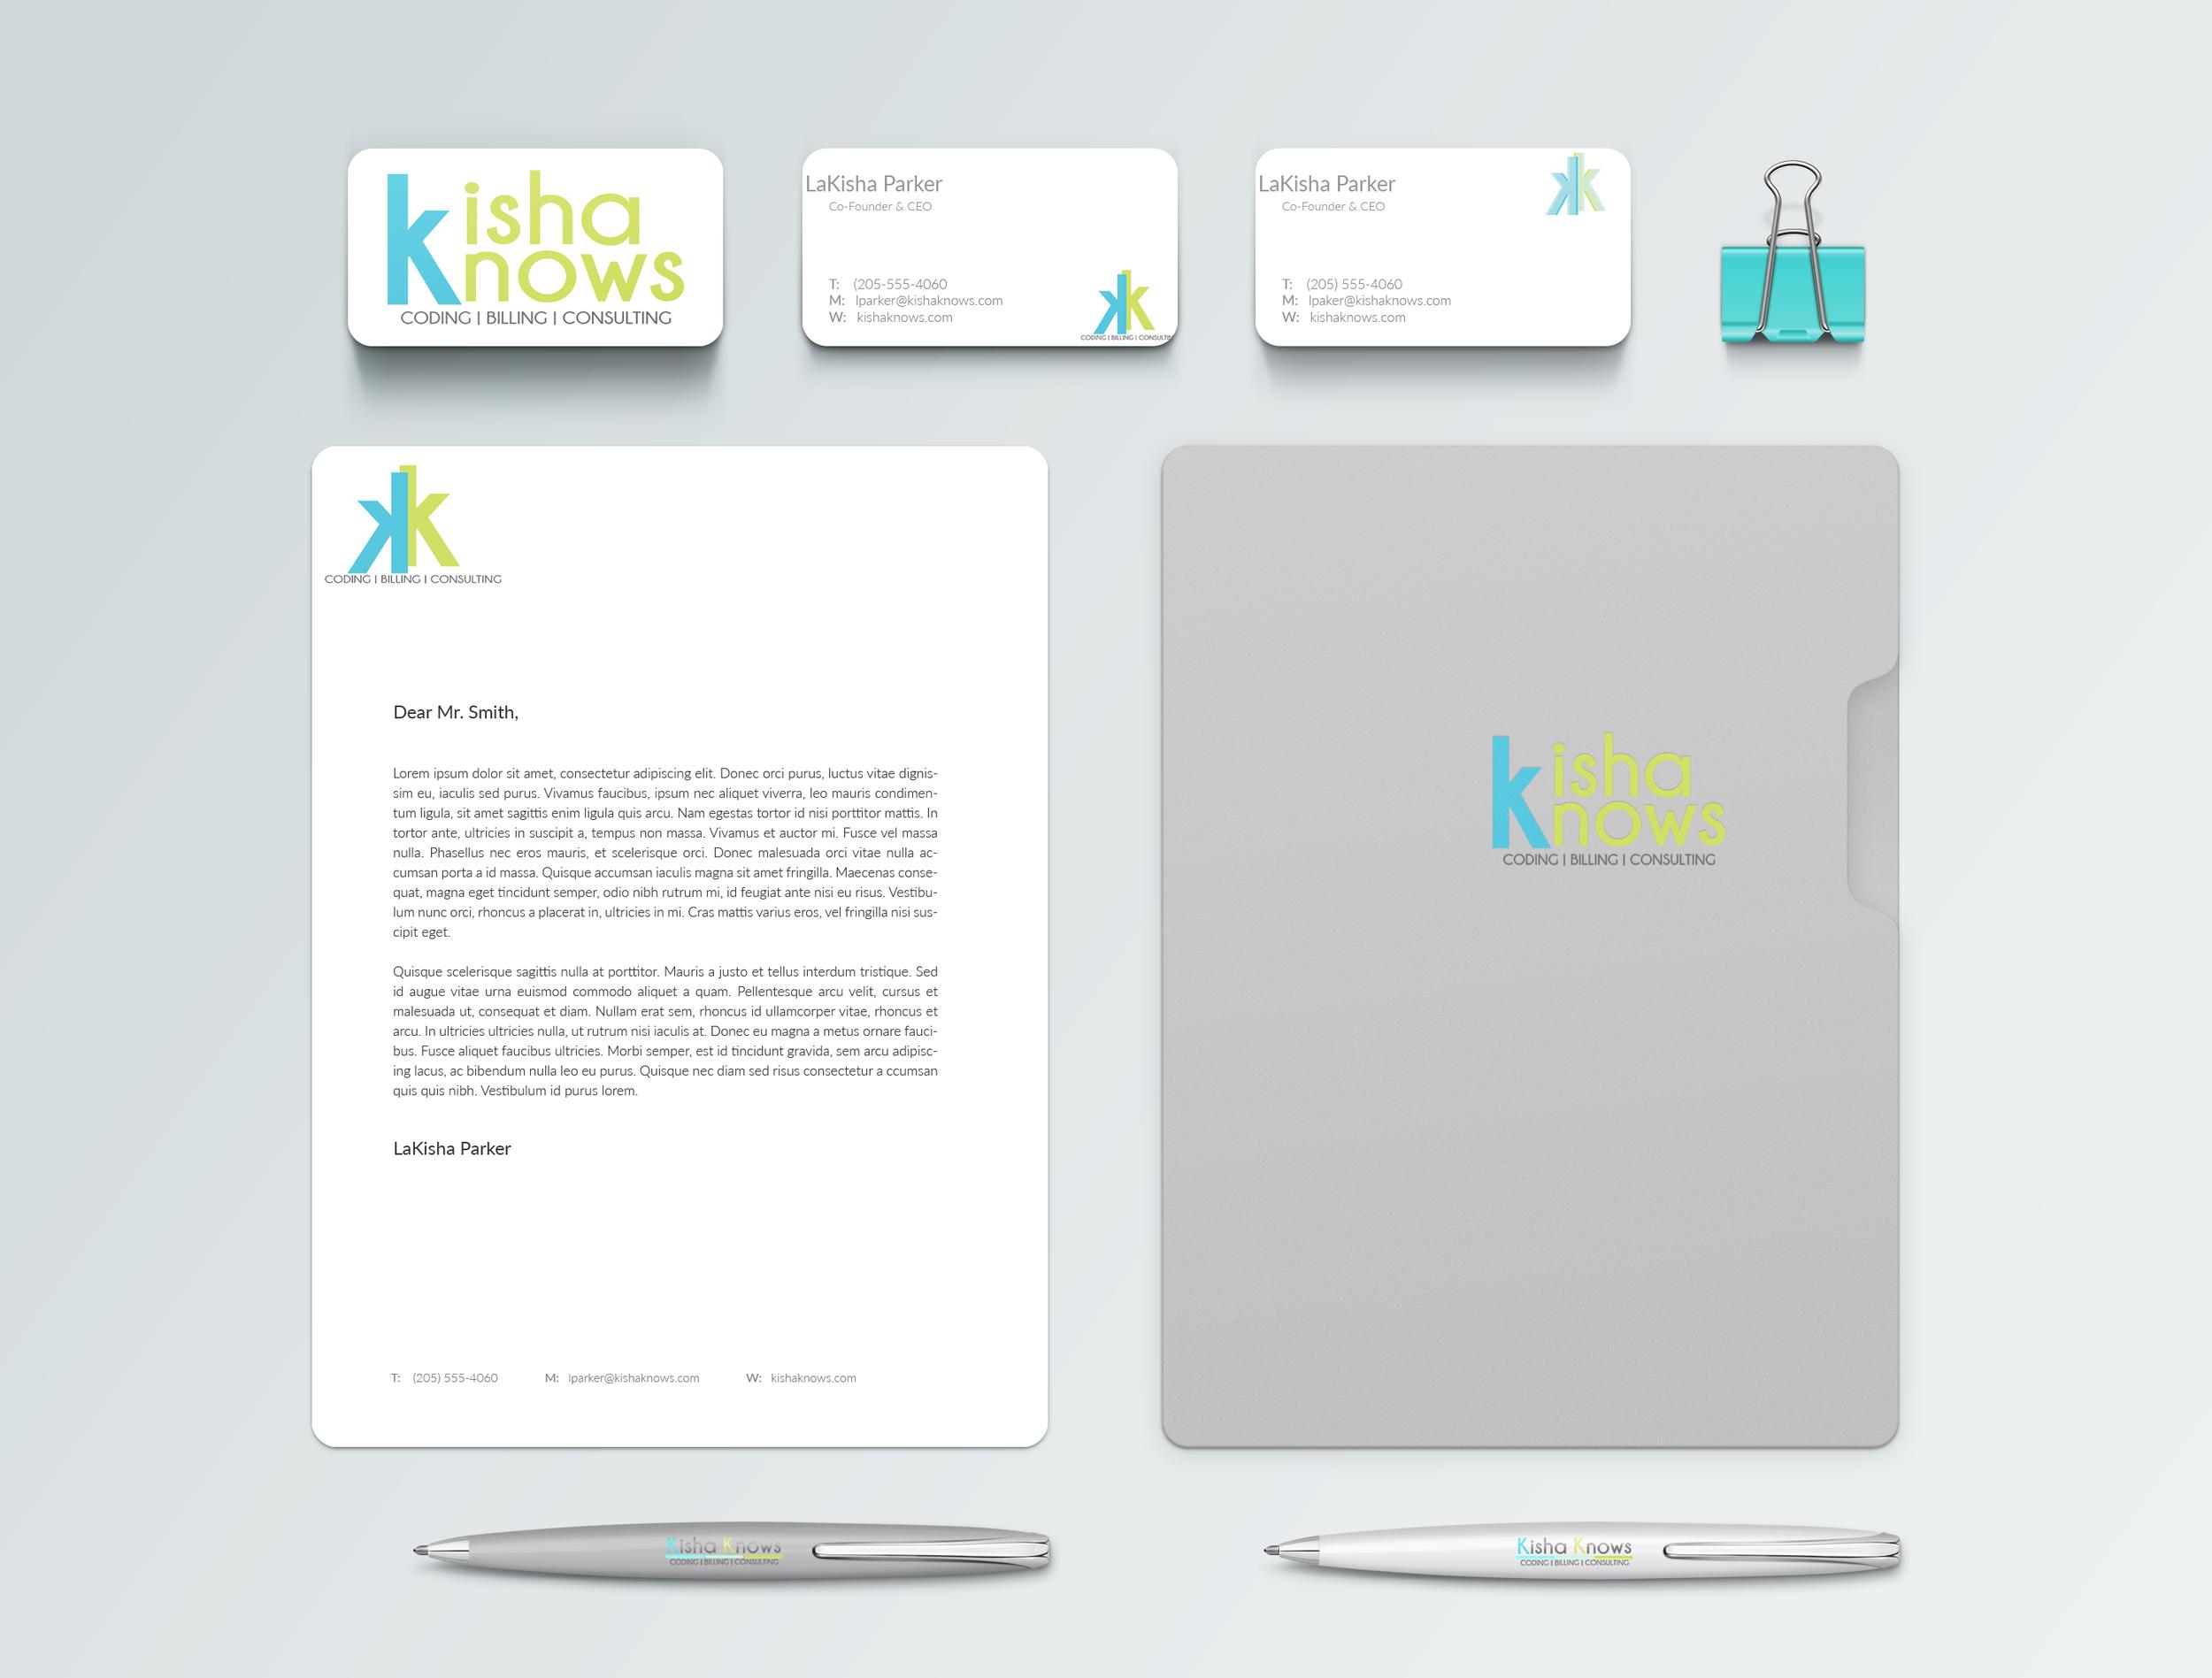 Kisha Knows Coding Branding Identity Mockup_KKC by Shelly C Studio Hinesville Savannah GA Graphic Design, Website Design